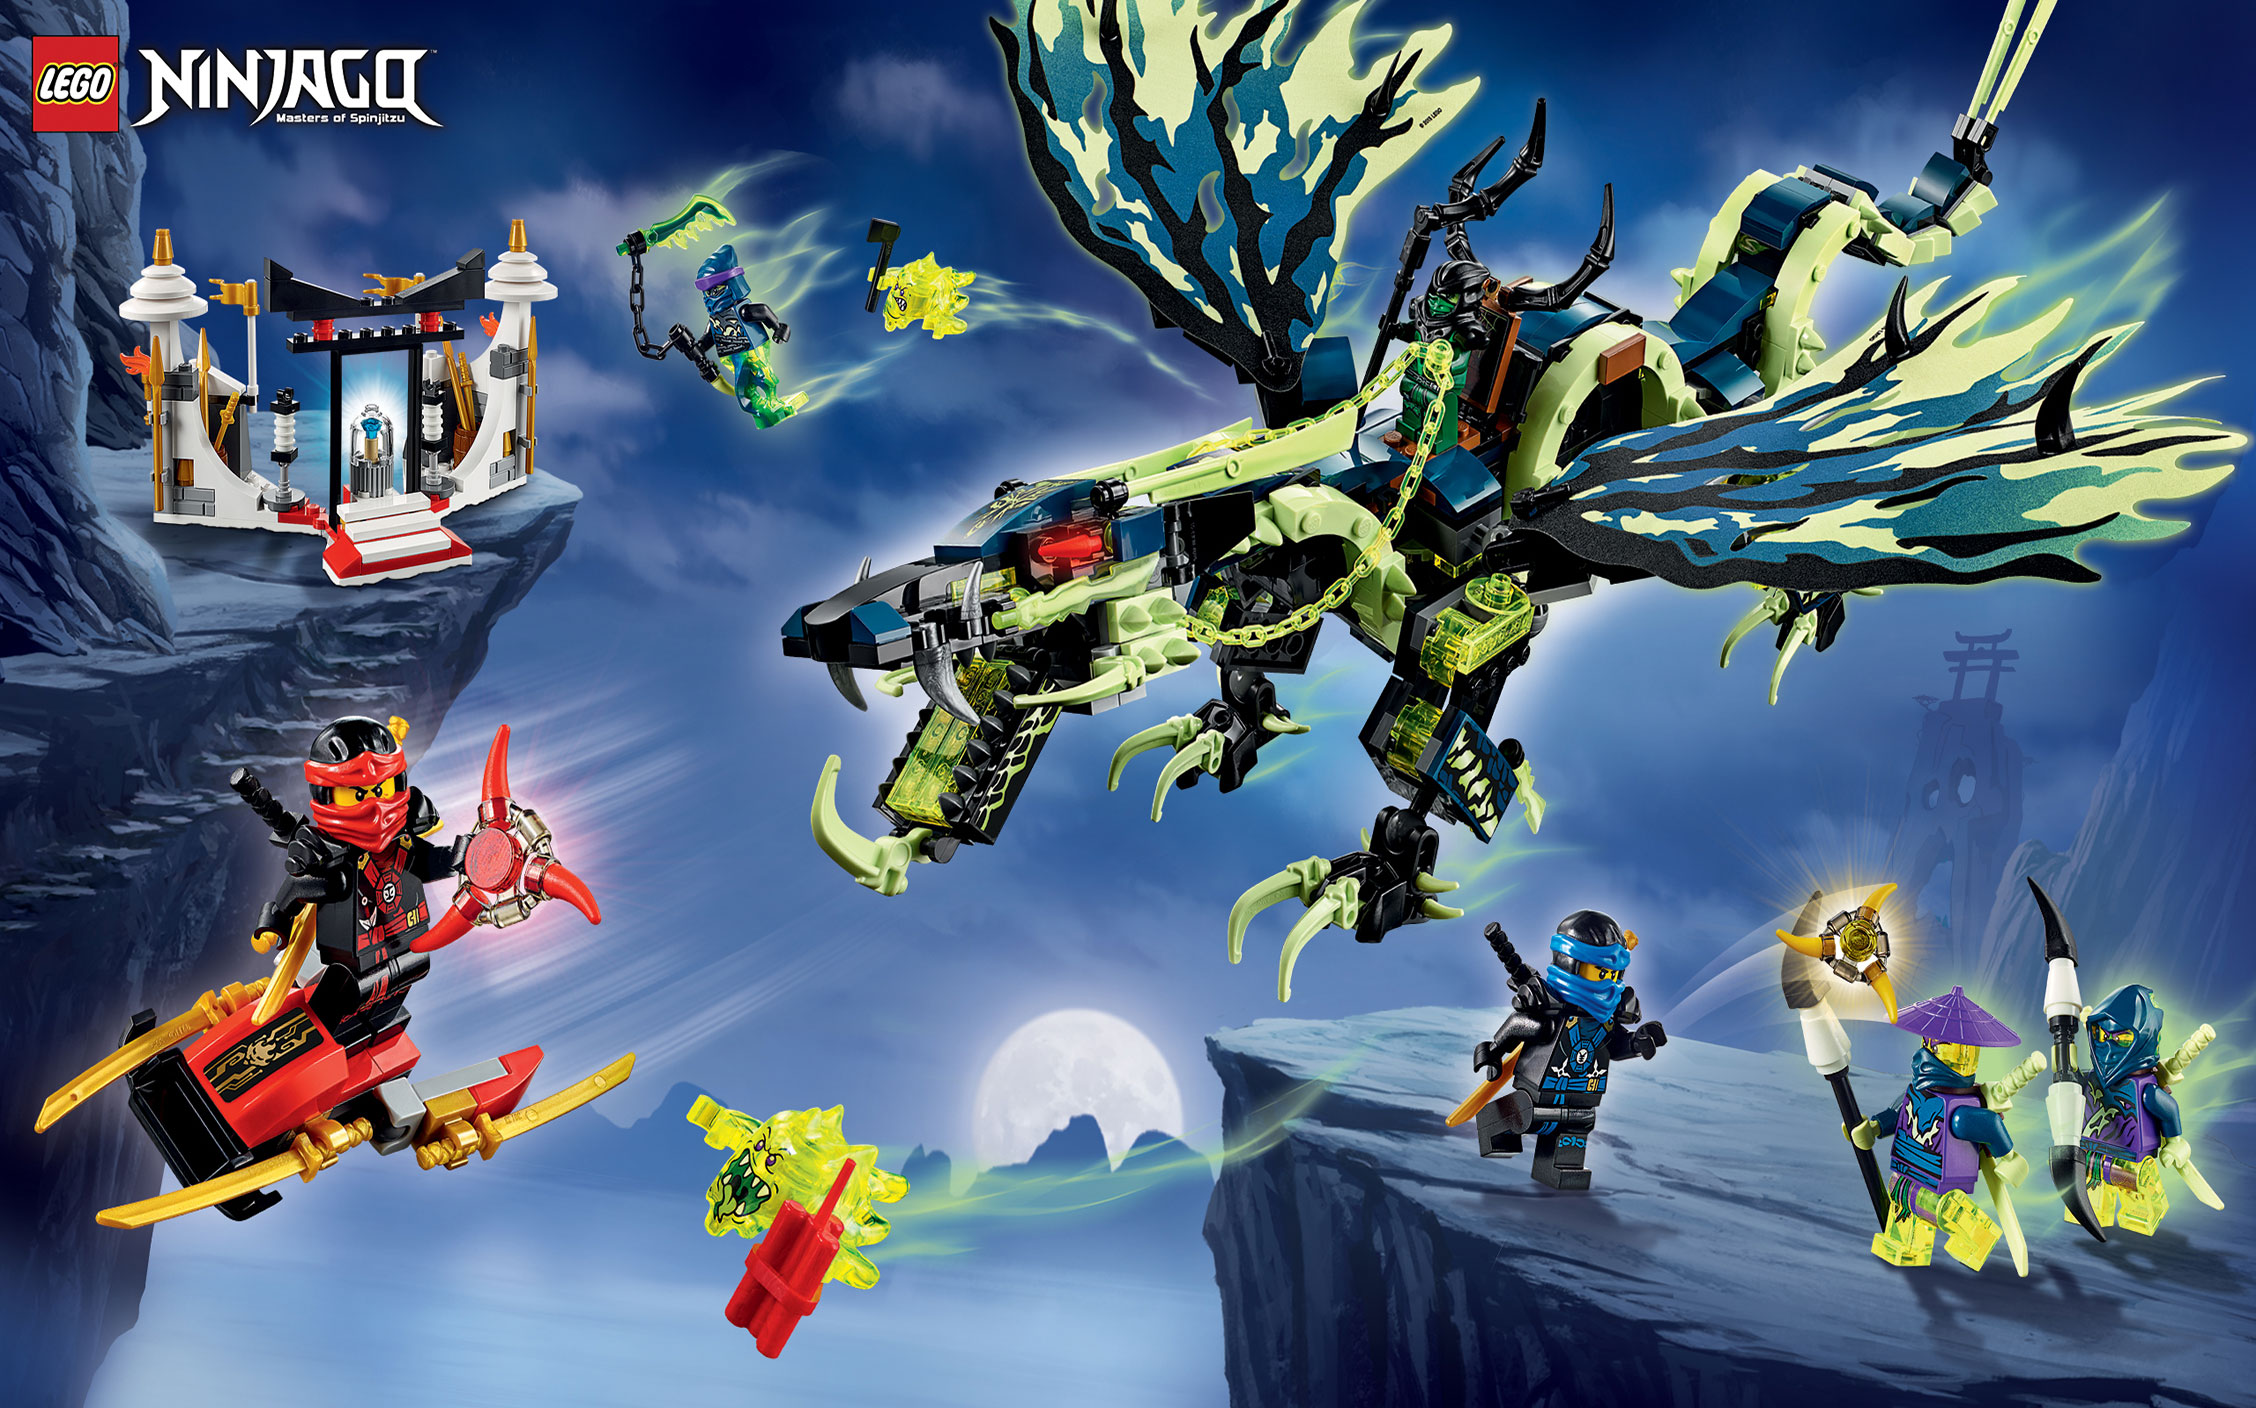 70736   Wallpaper   Activities   Ninjago LEGOcom 2256x1408